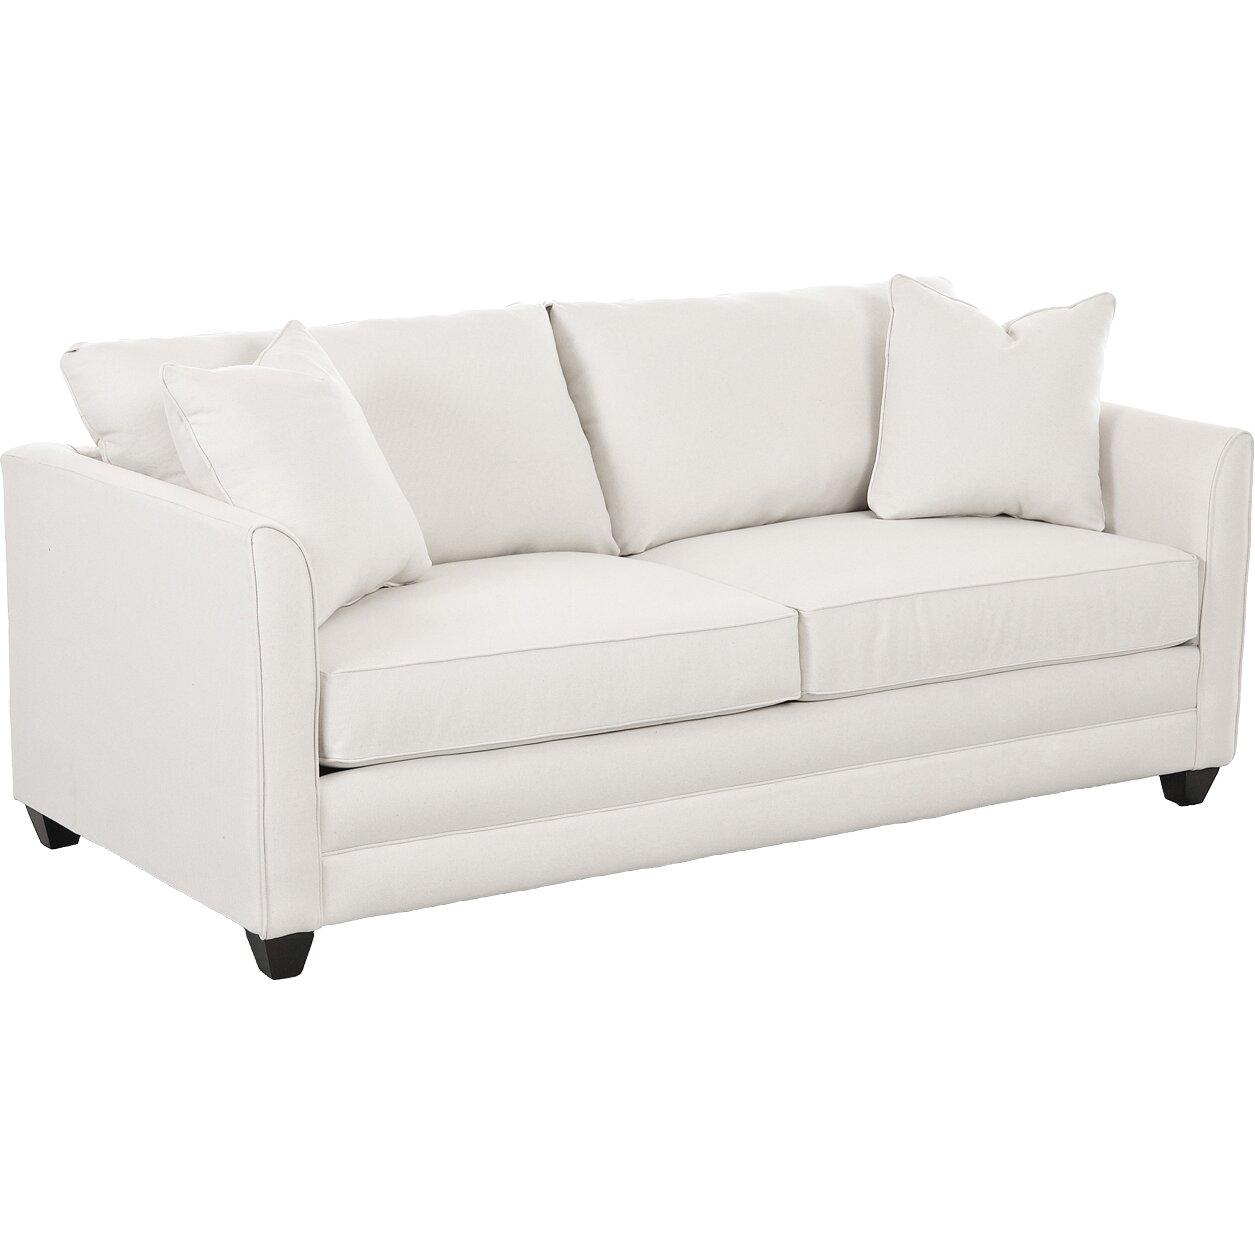 Wayfair custom upholstery sarah sleeper sofa reviews for White sectional sofa wayfair